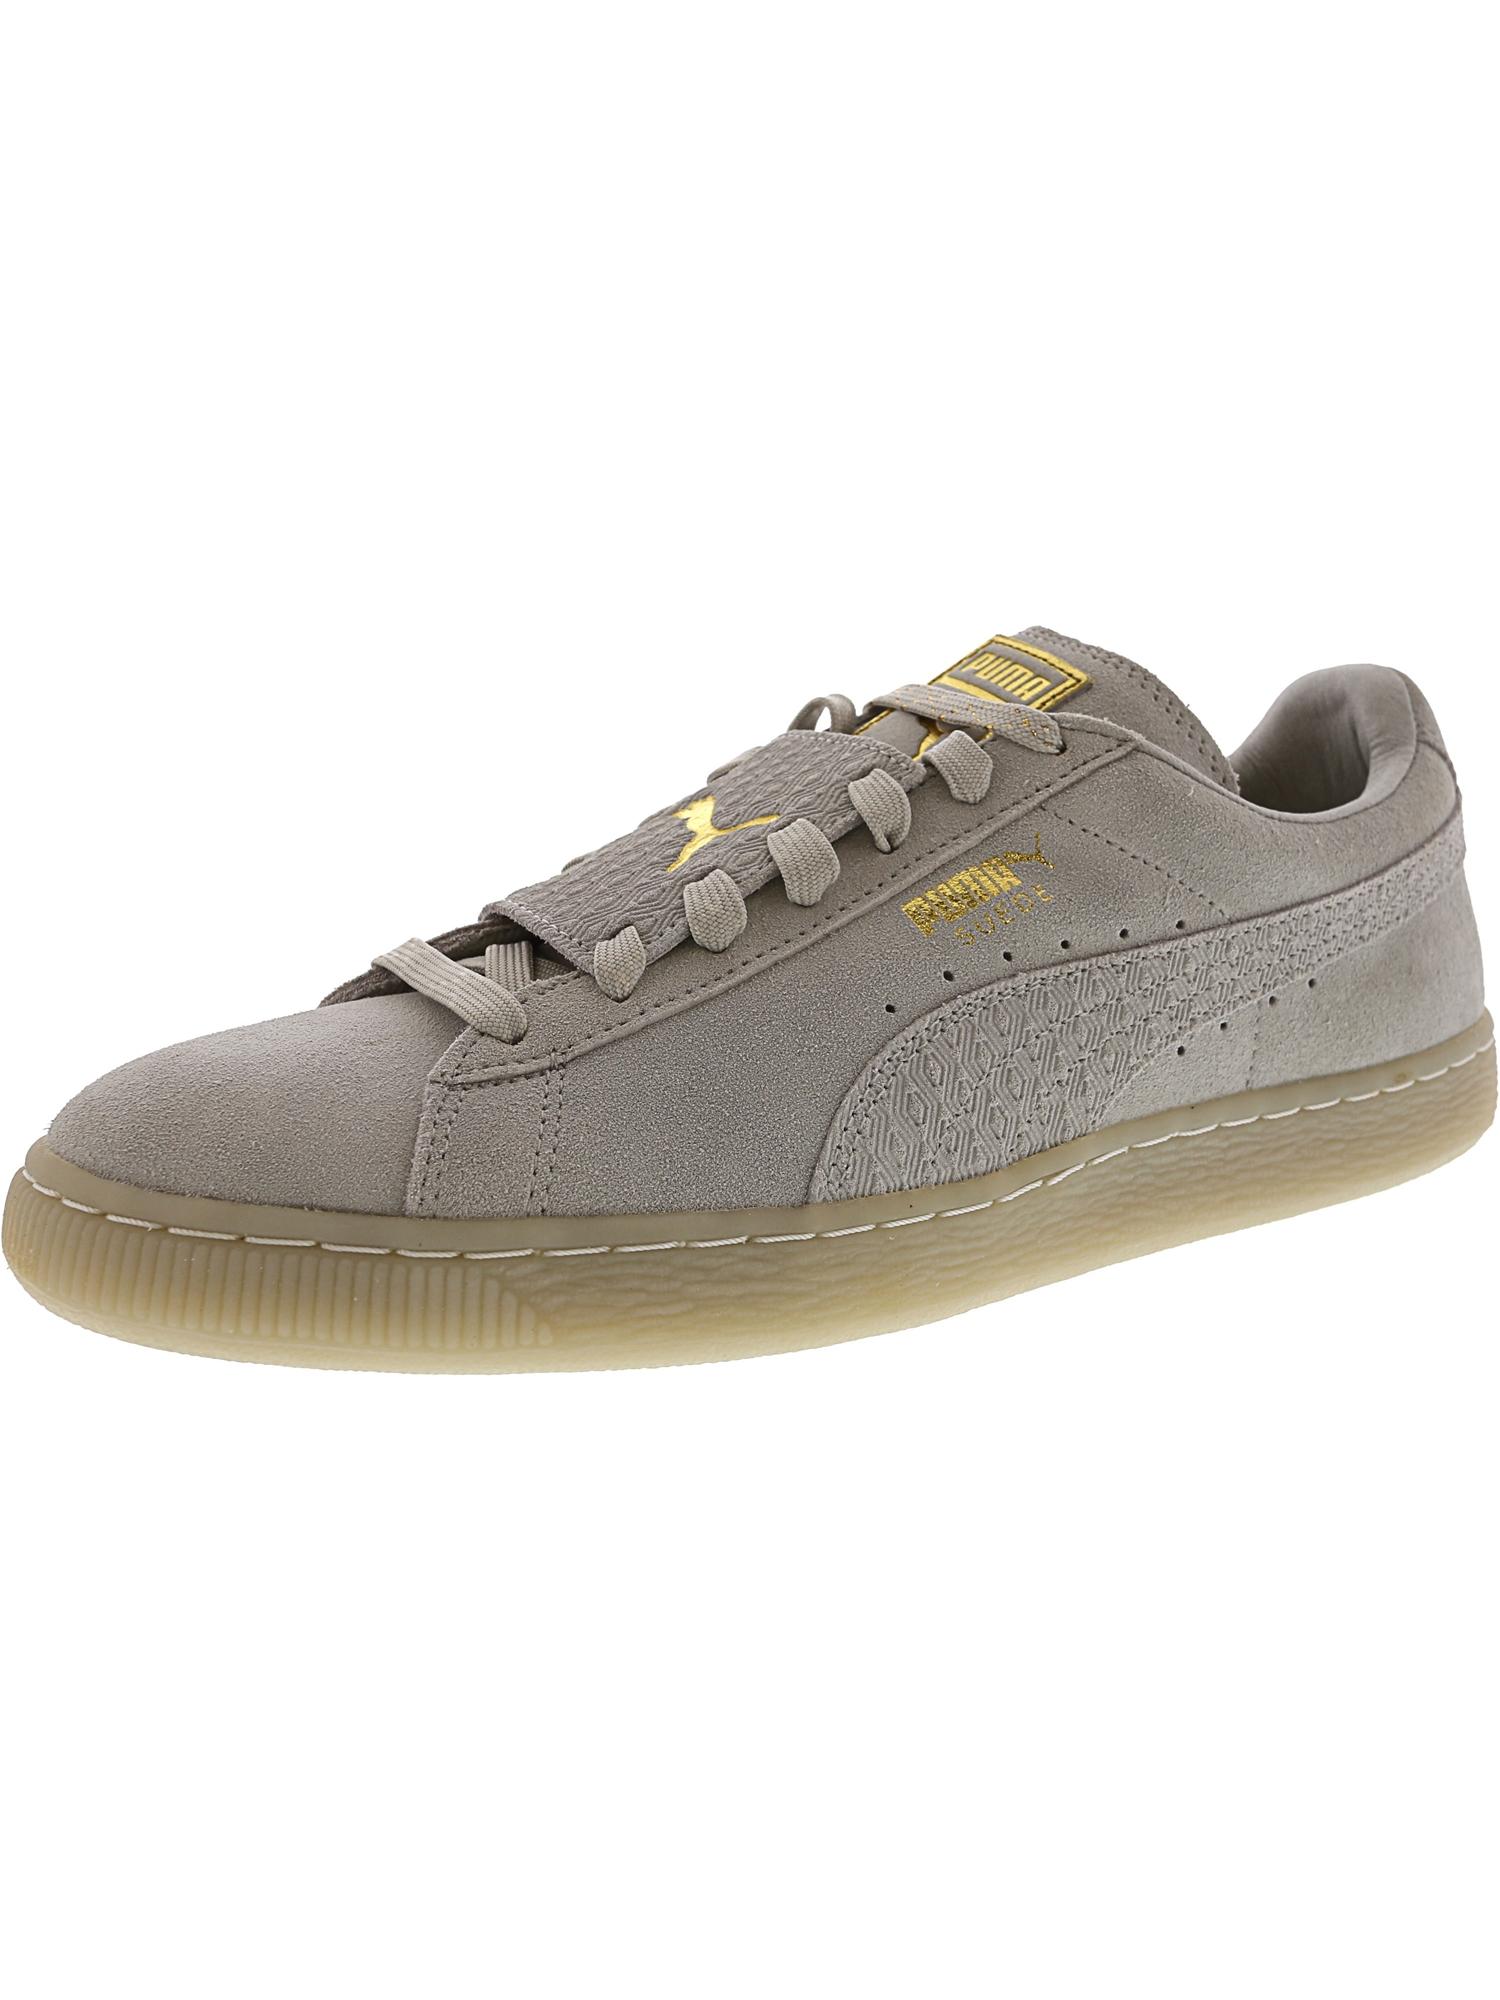 Puma Men's Suede Epic Remix Glacier Grey / White Ankle-High Fashion Sneaker - 9.5M